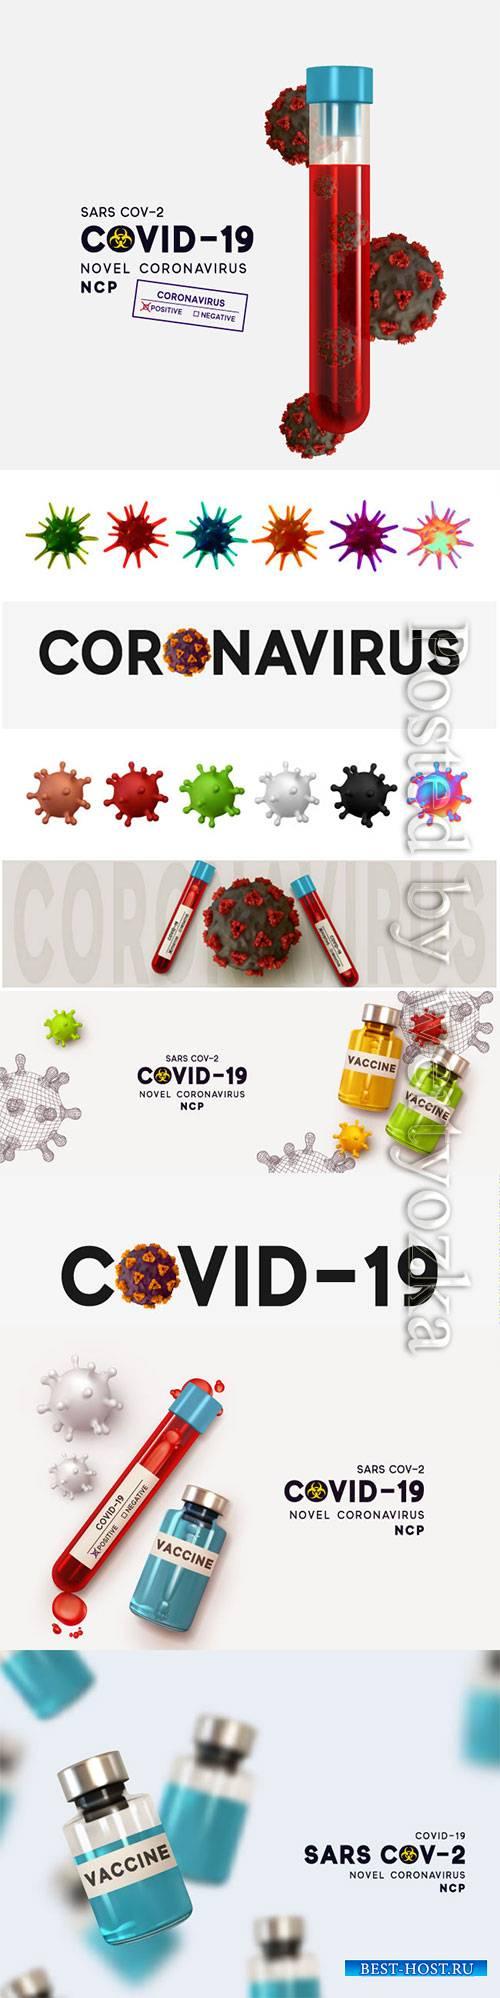 COVID 19, Coranavirus vector illustration sets # 19